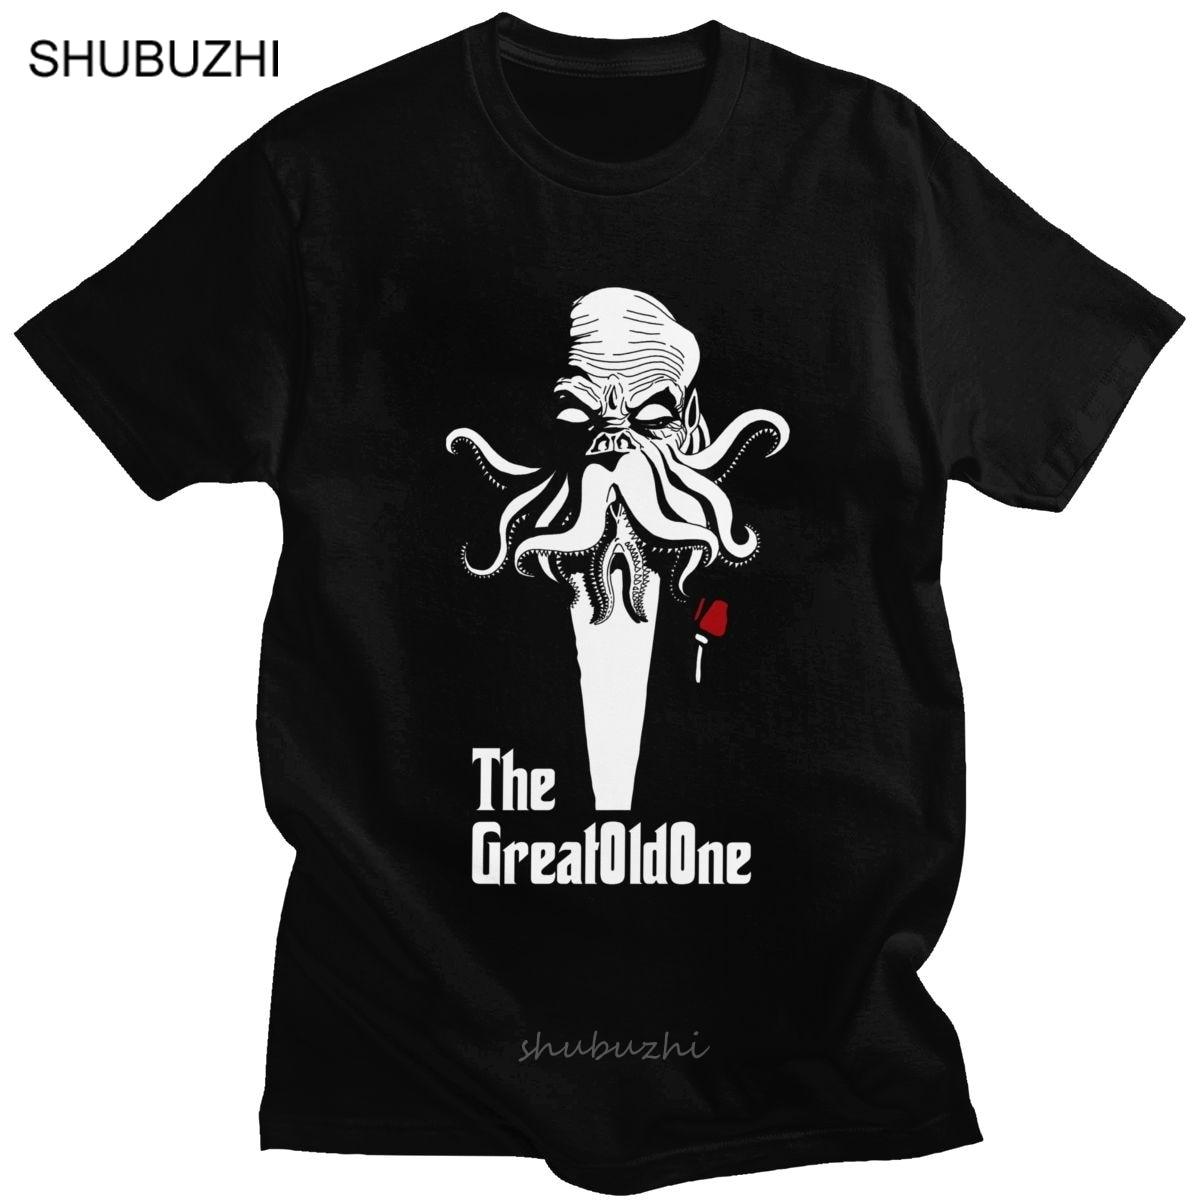 Parodia Cthulhu, camiseta para hombre, cuello redondo, Manga corta H.P. Camiseta de verano Lovecraft con pulpo, Camiseta de algodón suave de corte Regular, camisetas Merch